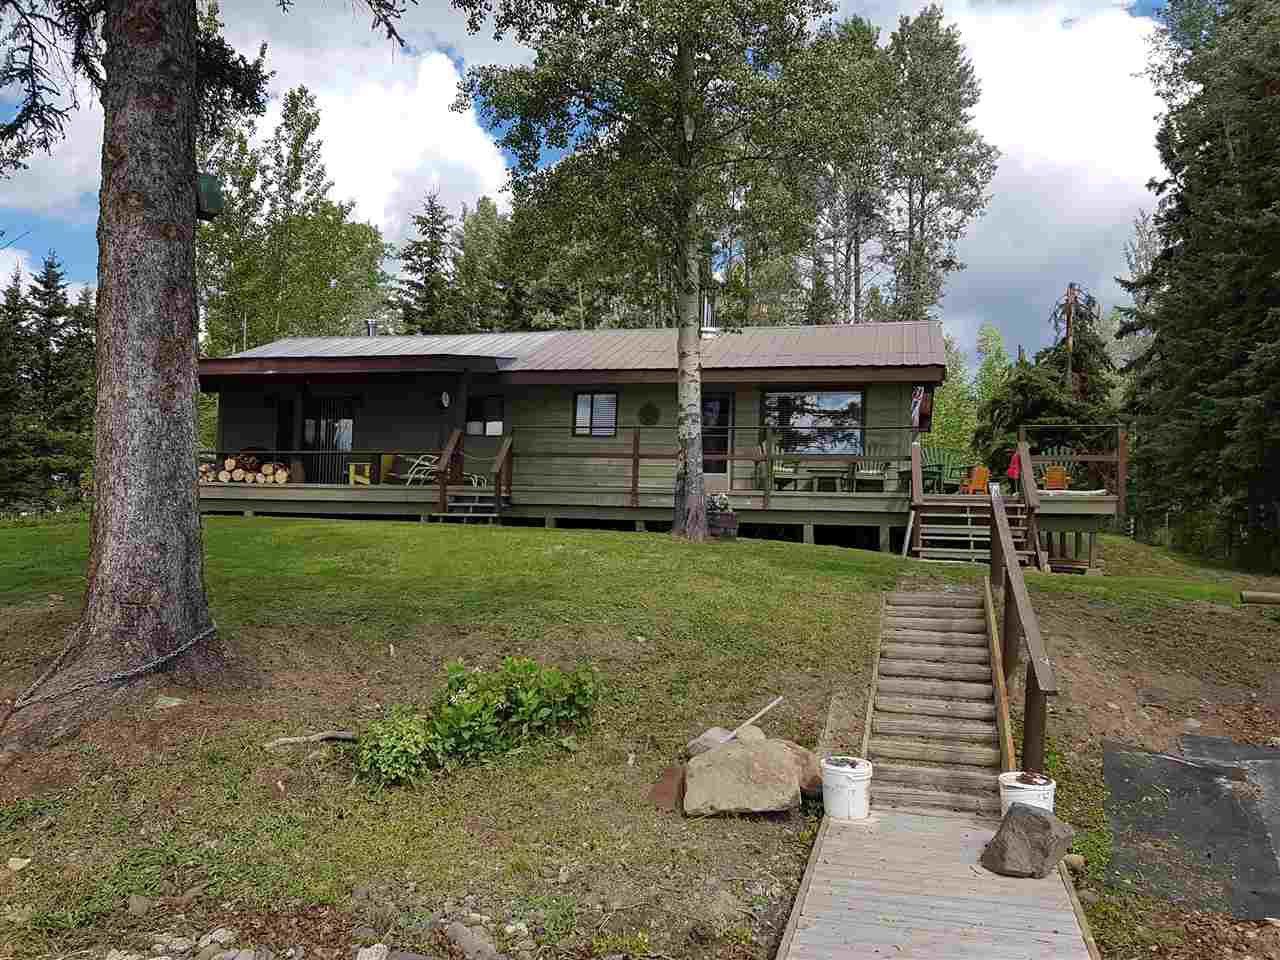 Photo 6: Photos: 7898 DEAN Road in Bridge Lake: Bridge Lake/Sheridan Lake House for sale (100 Mile House (Zone 10))  : MLS®# R2274404